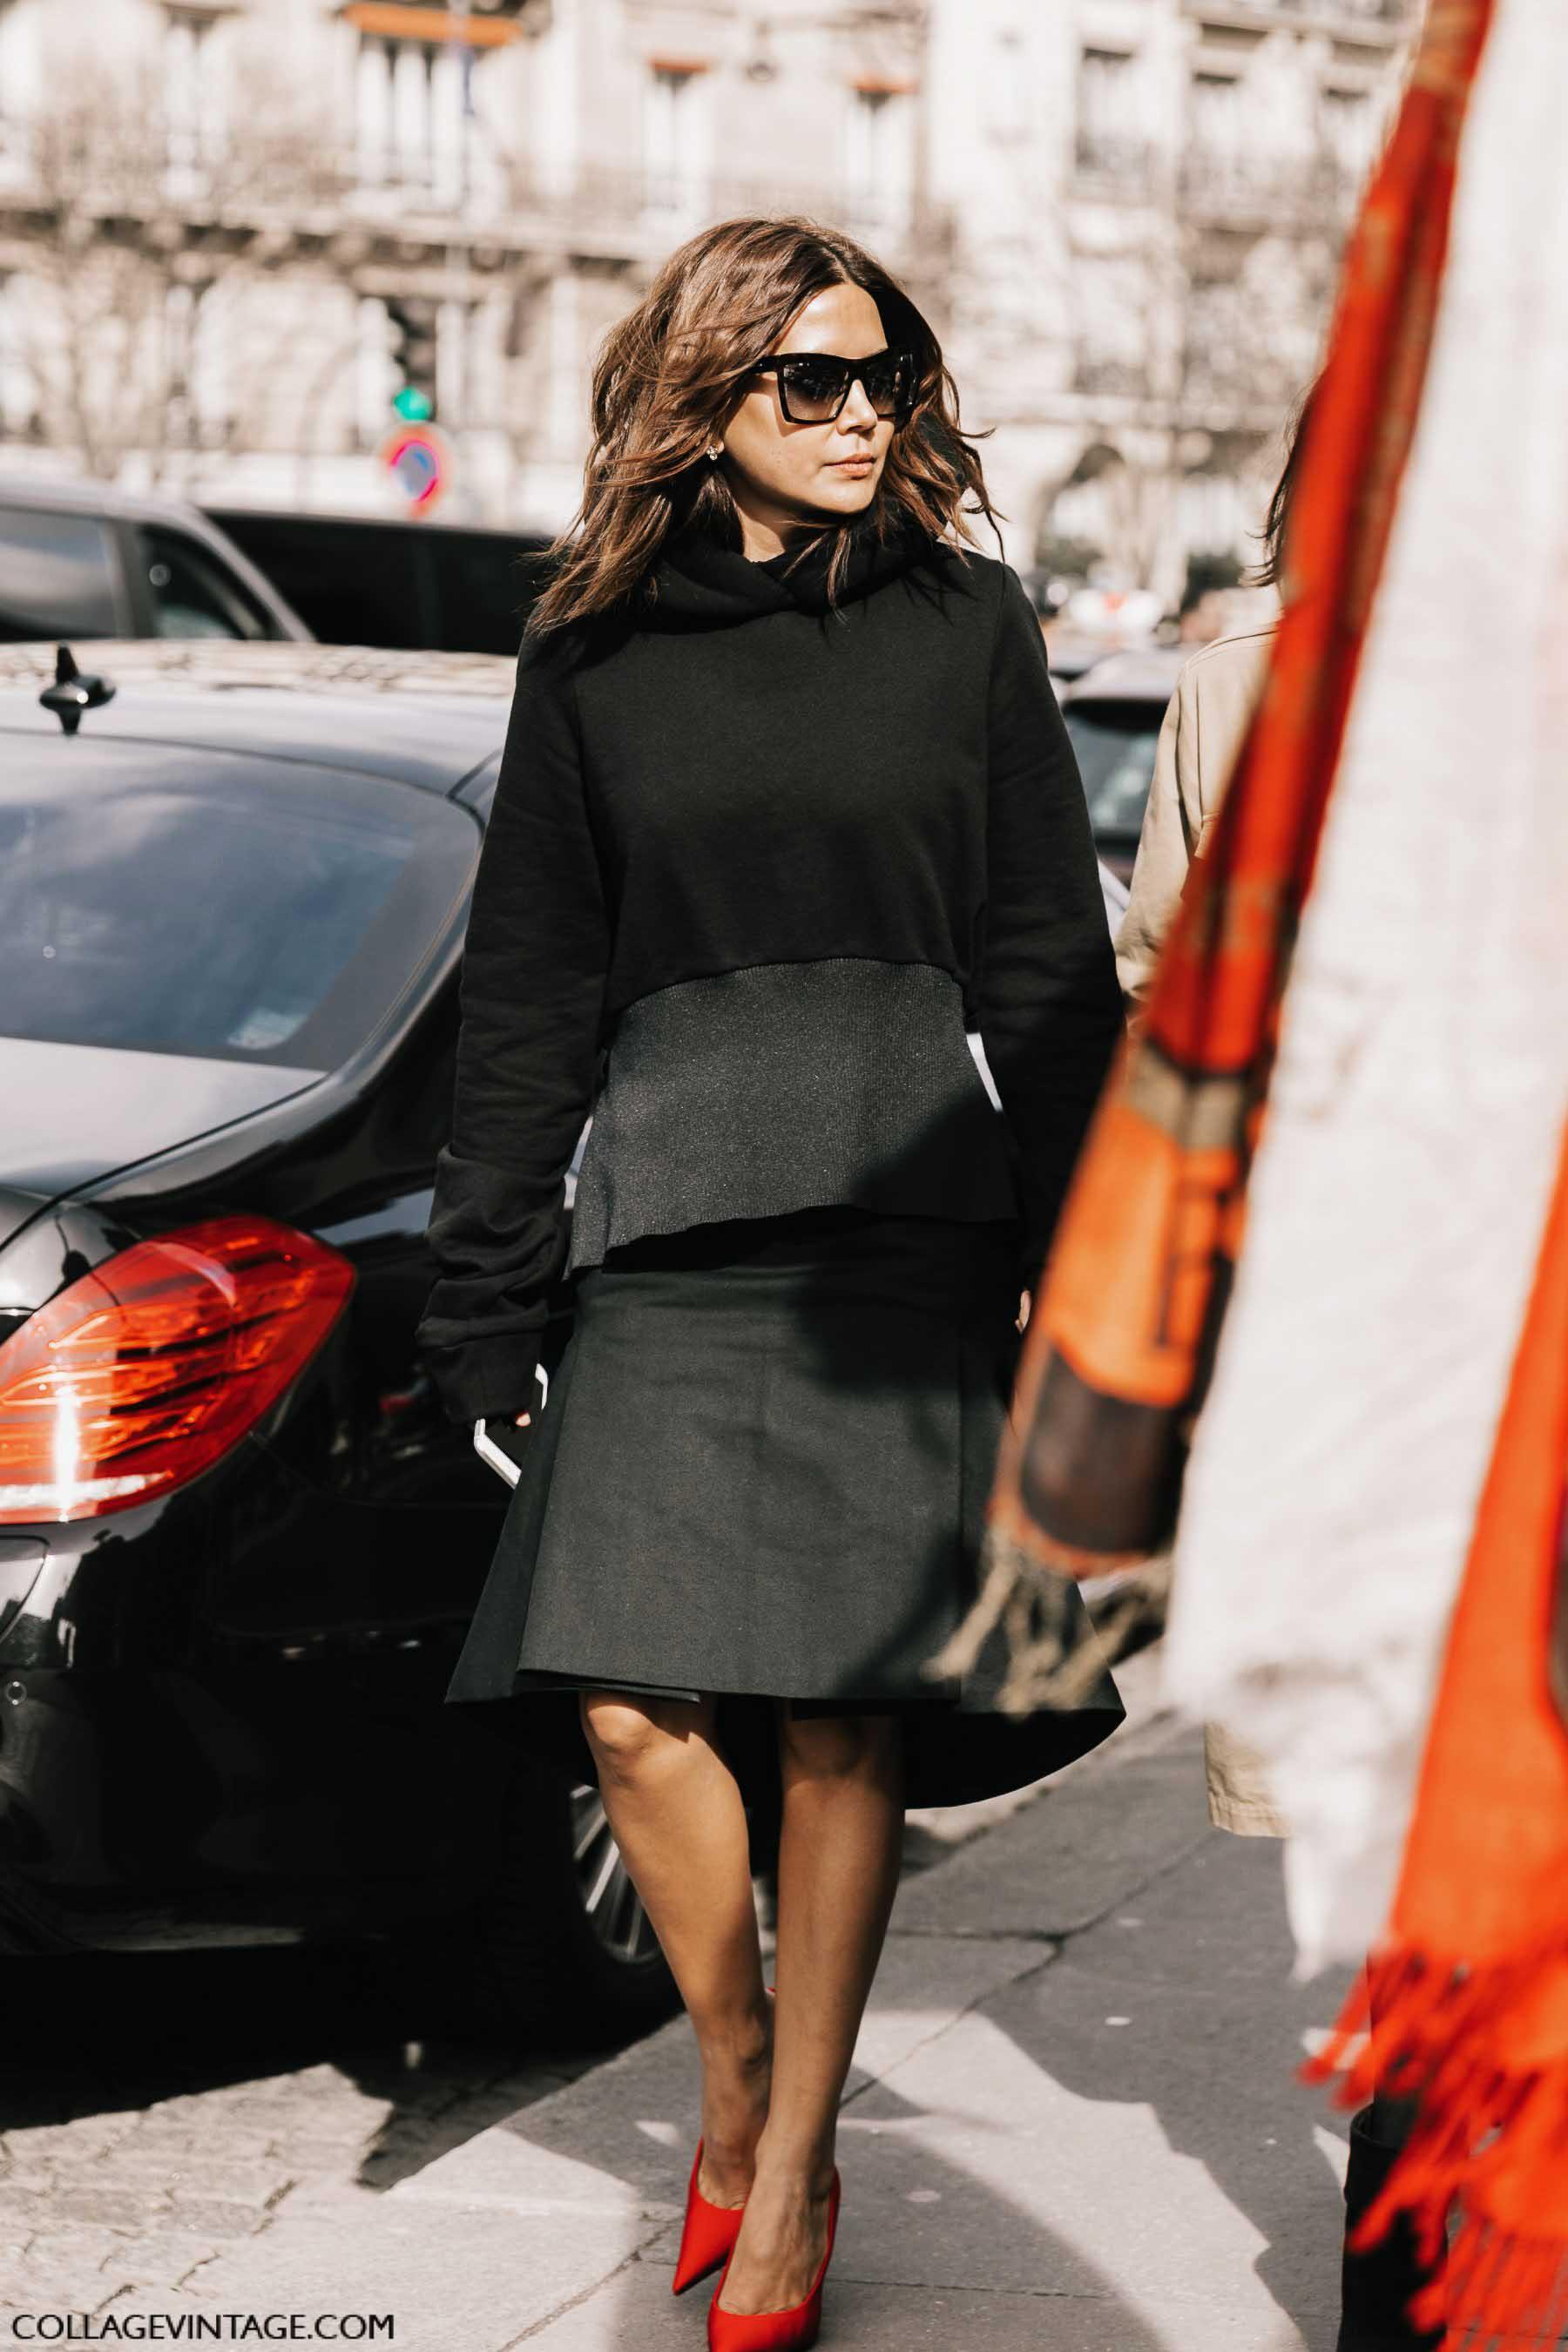 юбка-трапеция, осень-зима 2017, парижский гардероб, parisian chic, parisian street style